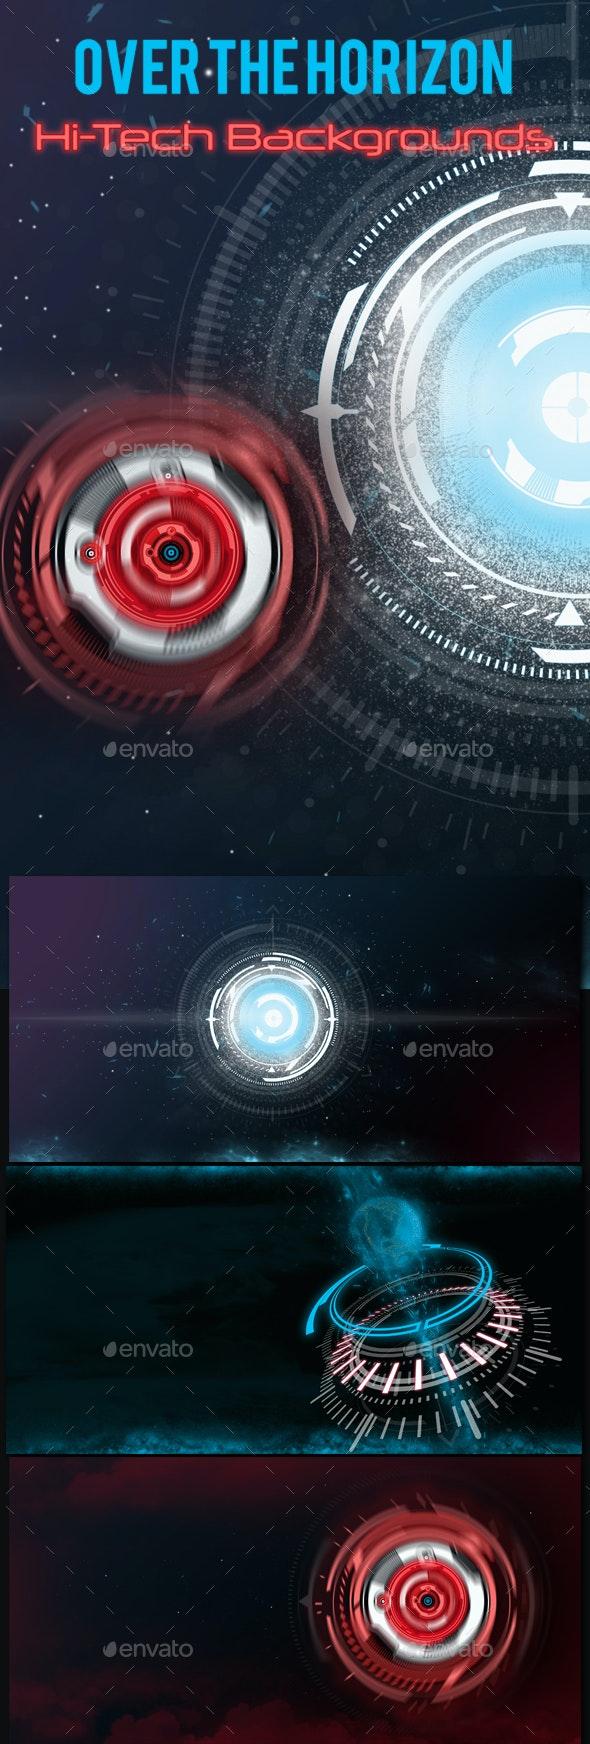 Hi-tech Backgrounds - Tech / Futuristic Backgrounds